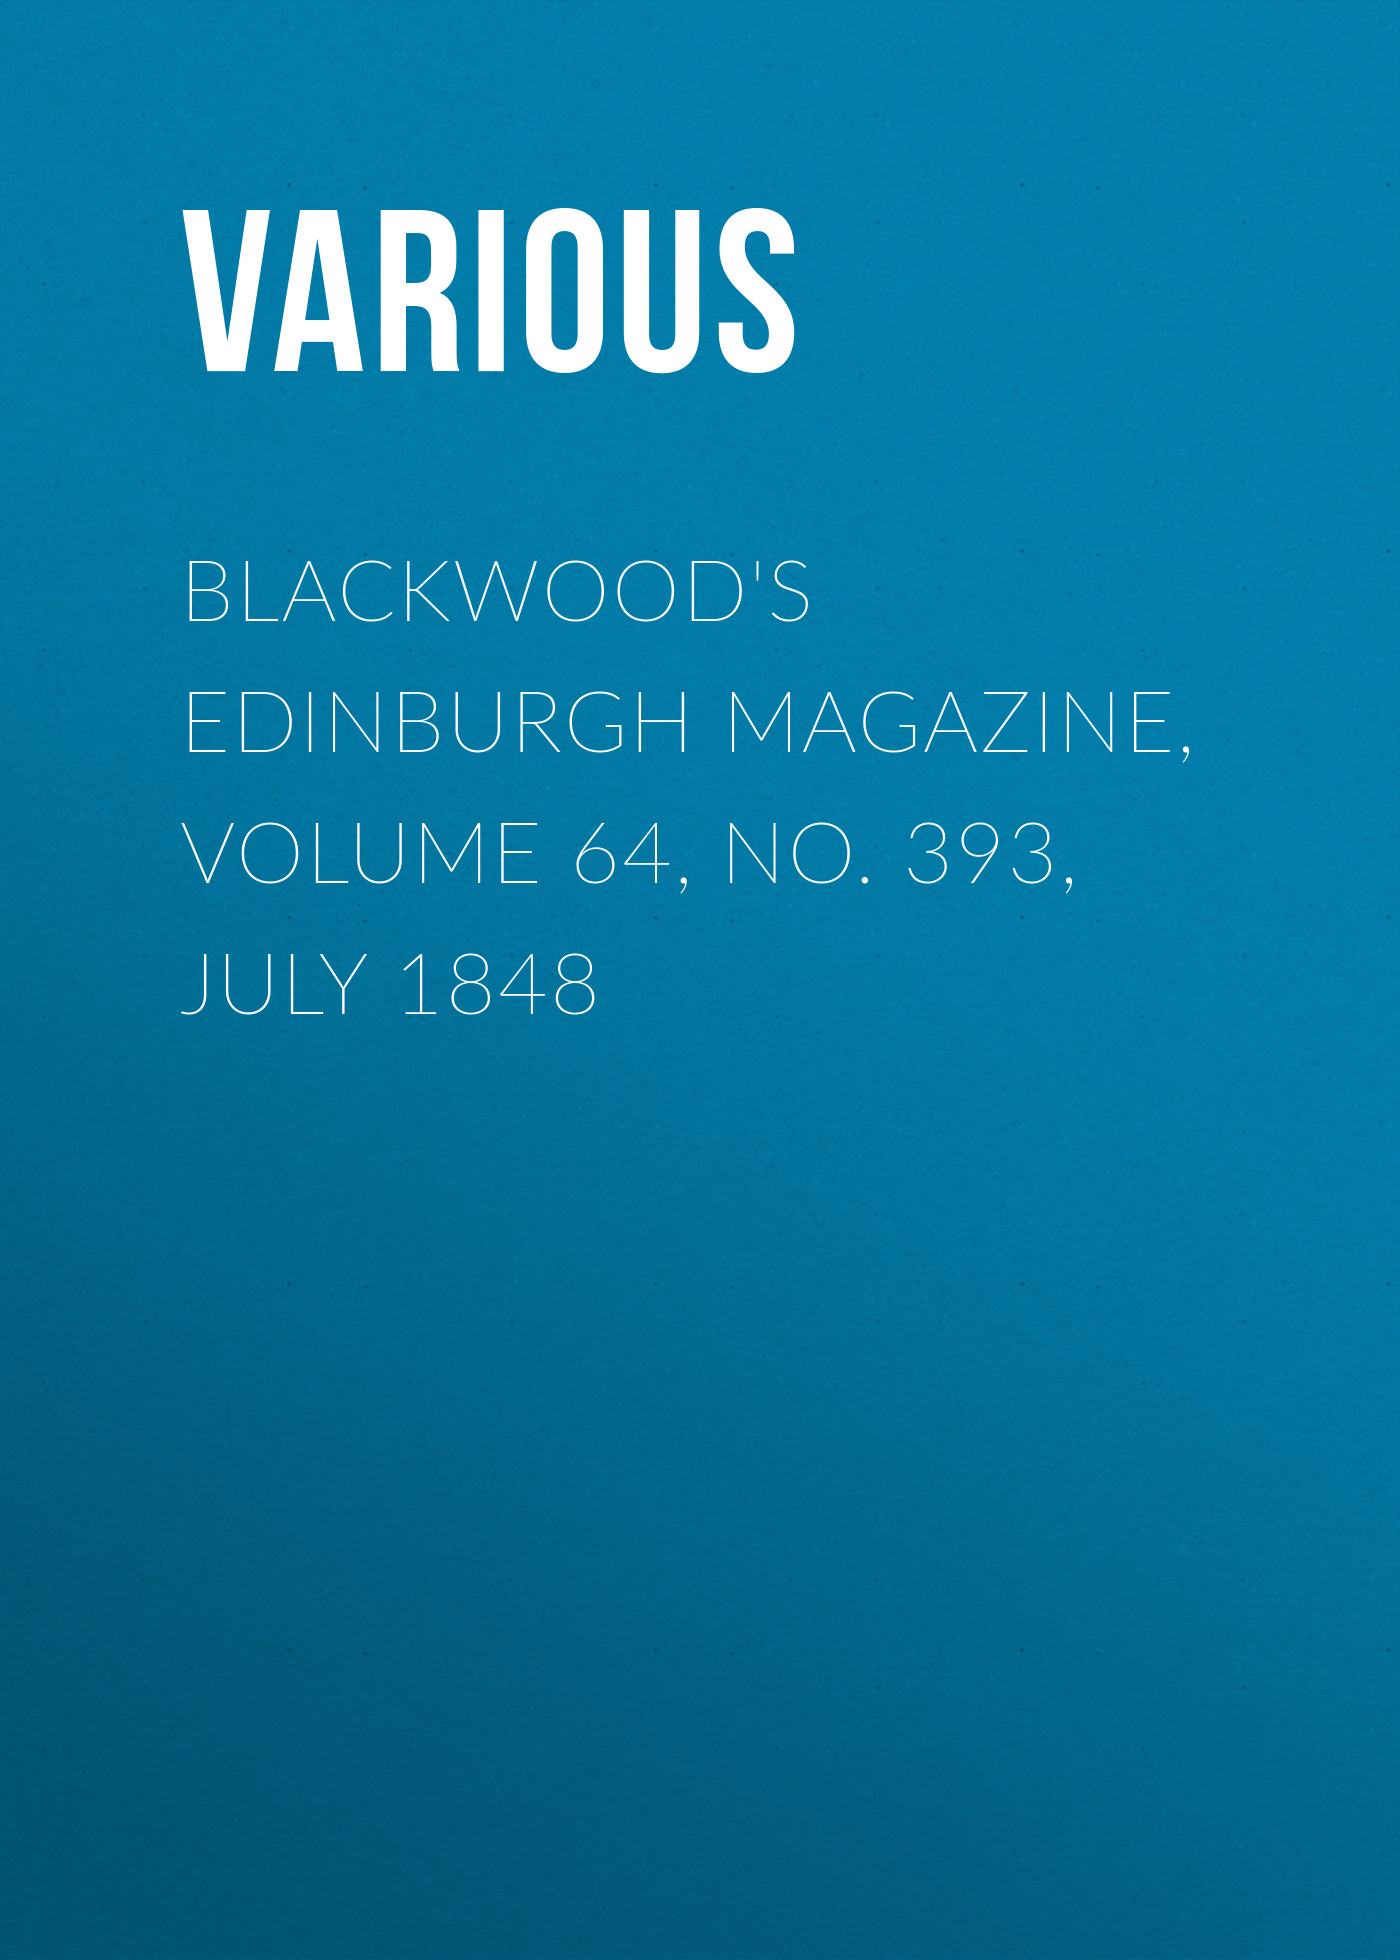 Various Blackwood's Edinburgh Magazine, Volume 64, No. 393, July 1848 various harper s new monthly magazine volume 1 no 2 july 1850